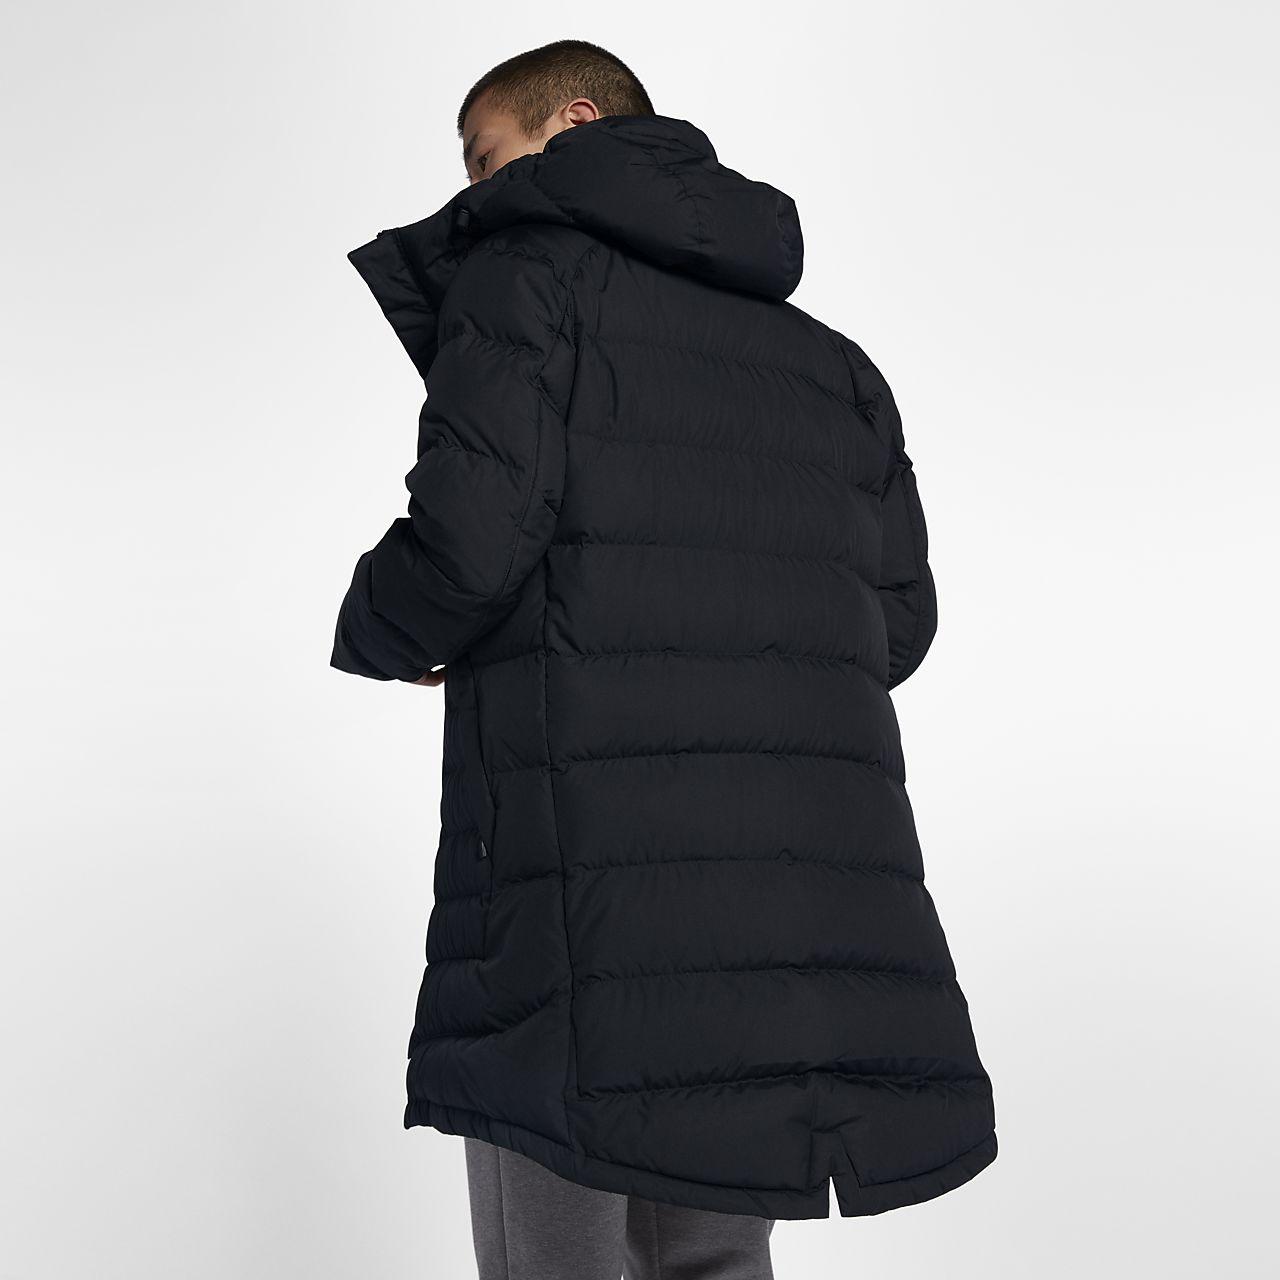 co uk Nike Unit4motors Jacket Mens Parka qqwXzI